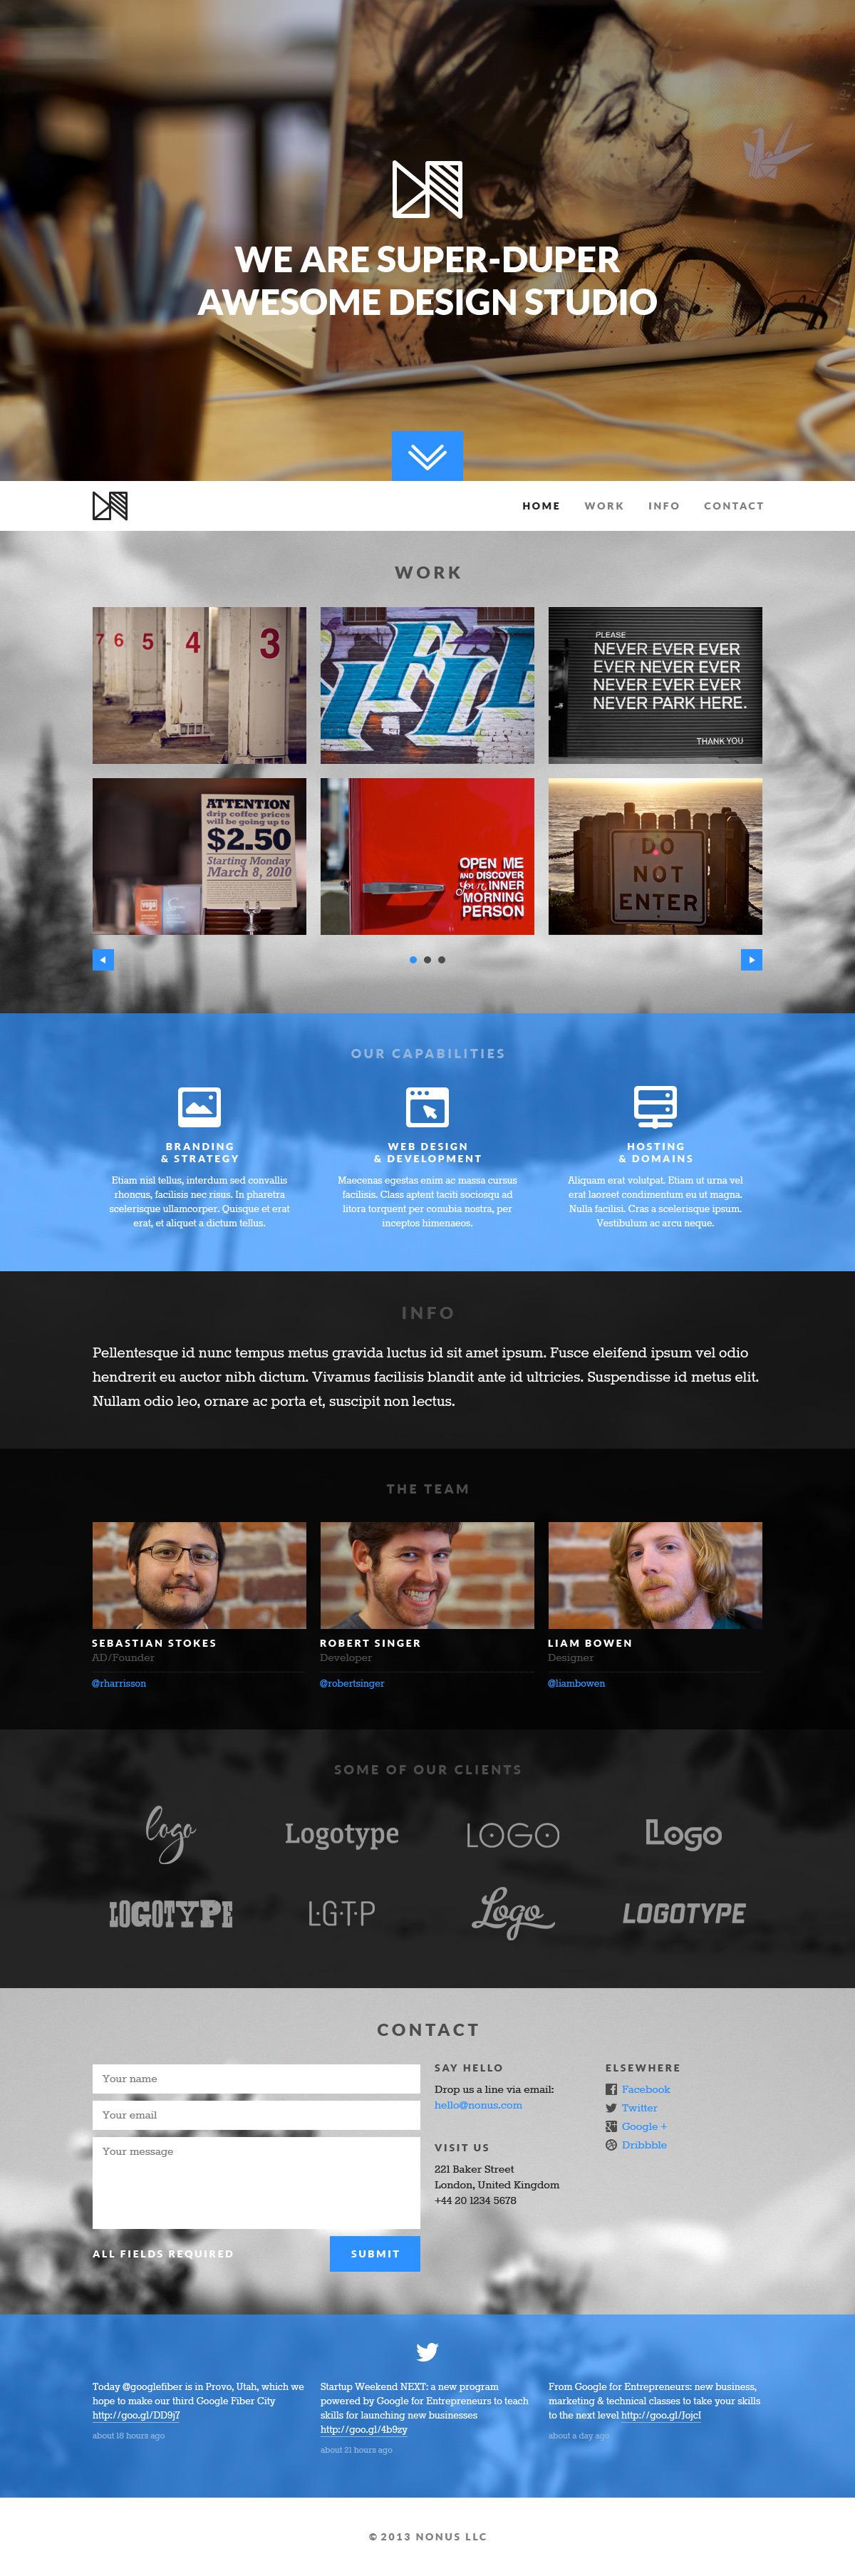 Nonus Parallax Wordpress Portfolio By Themewoodmen Themeforest